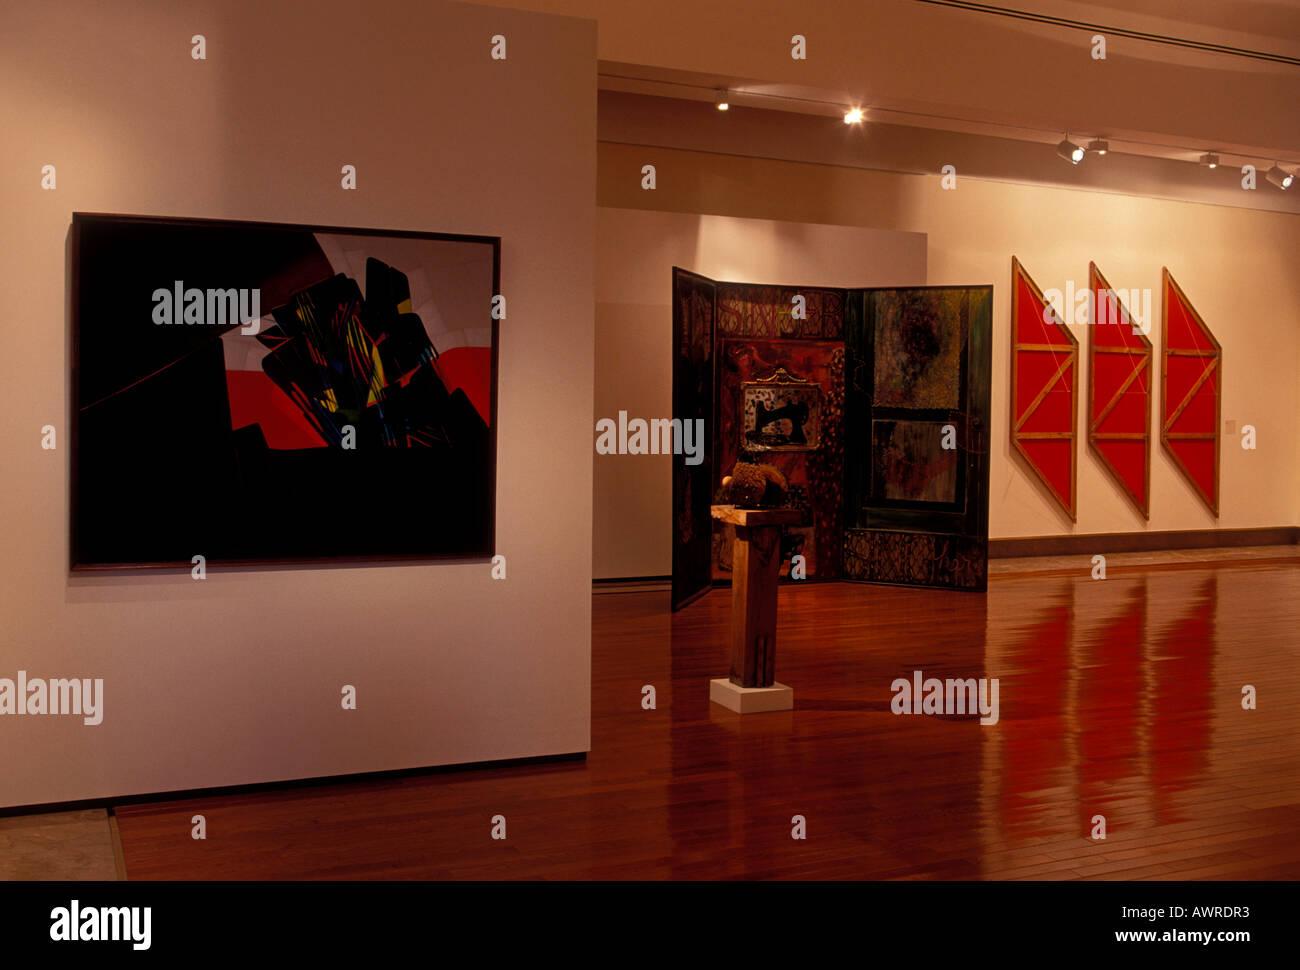 Paintings, exhibition hall, gallery, The Museum of Art of Puerto Rico, MAPR, Santurce, city of San Juan, Puerto Rico - Stock Image